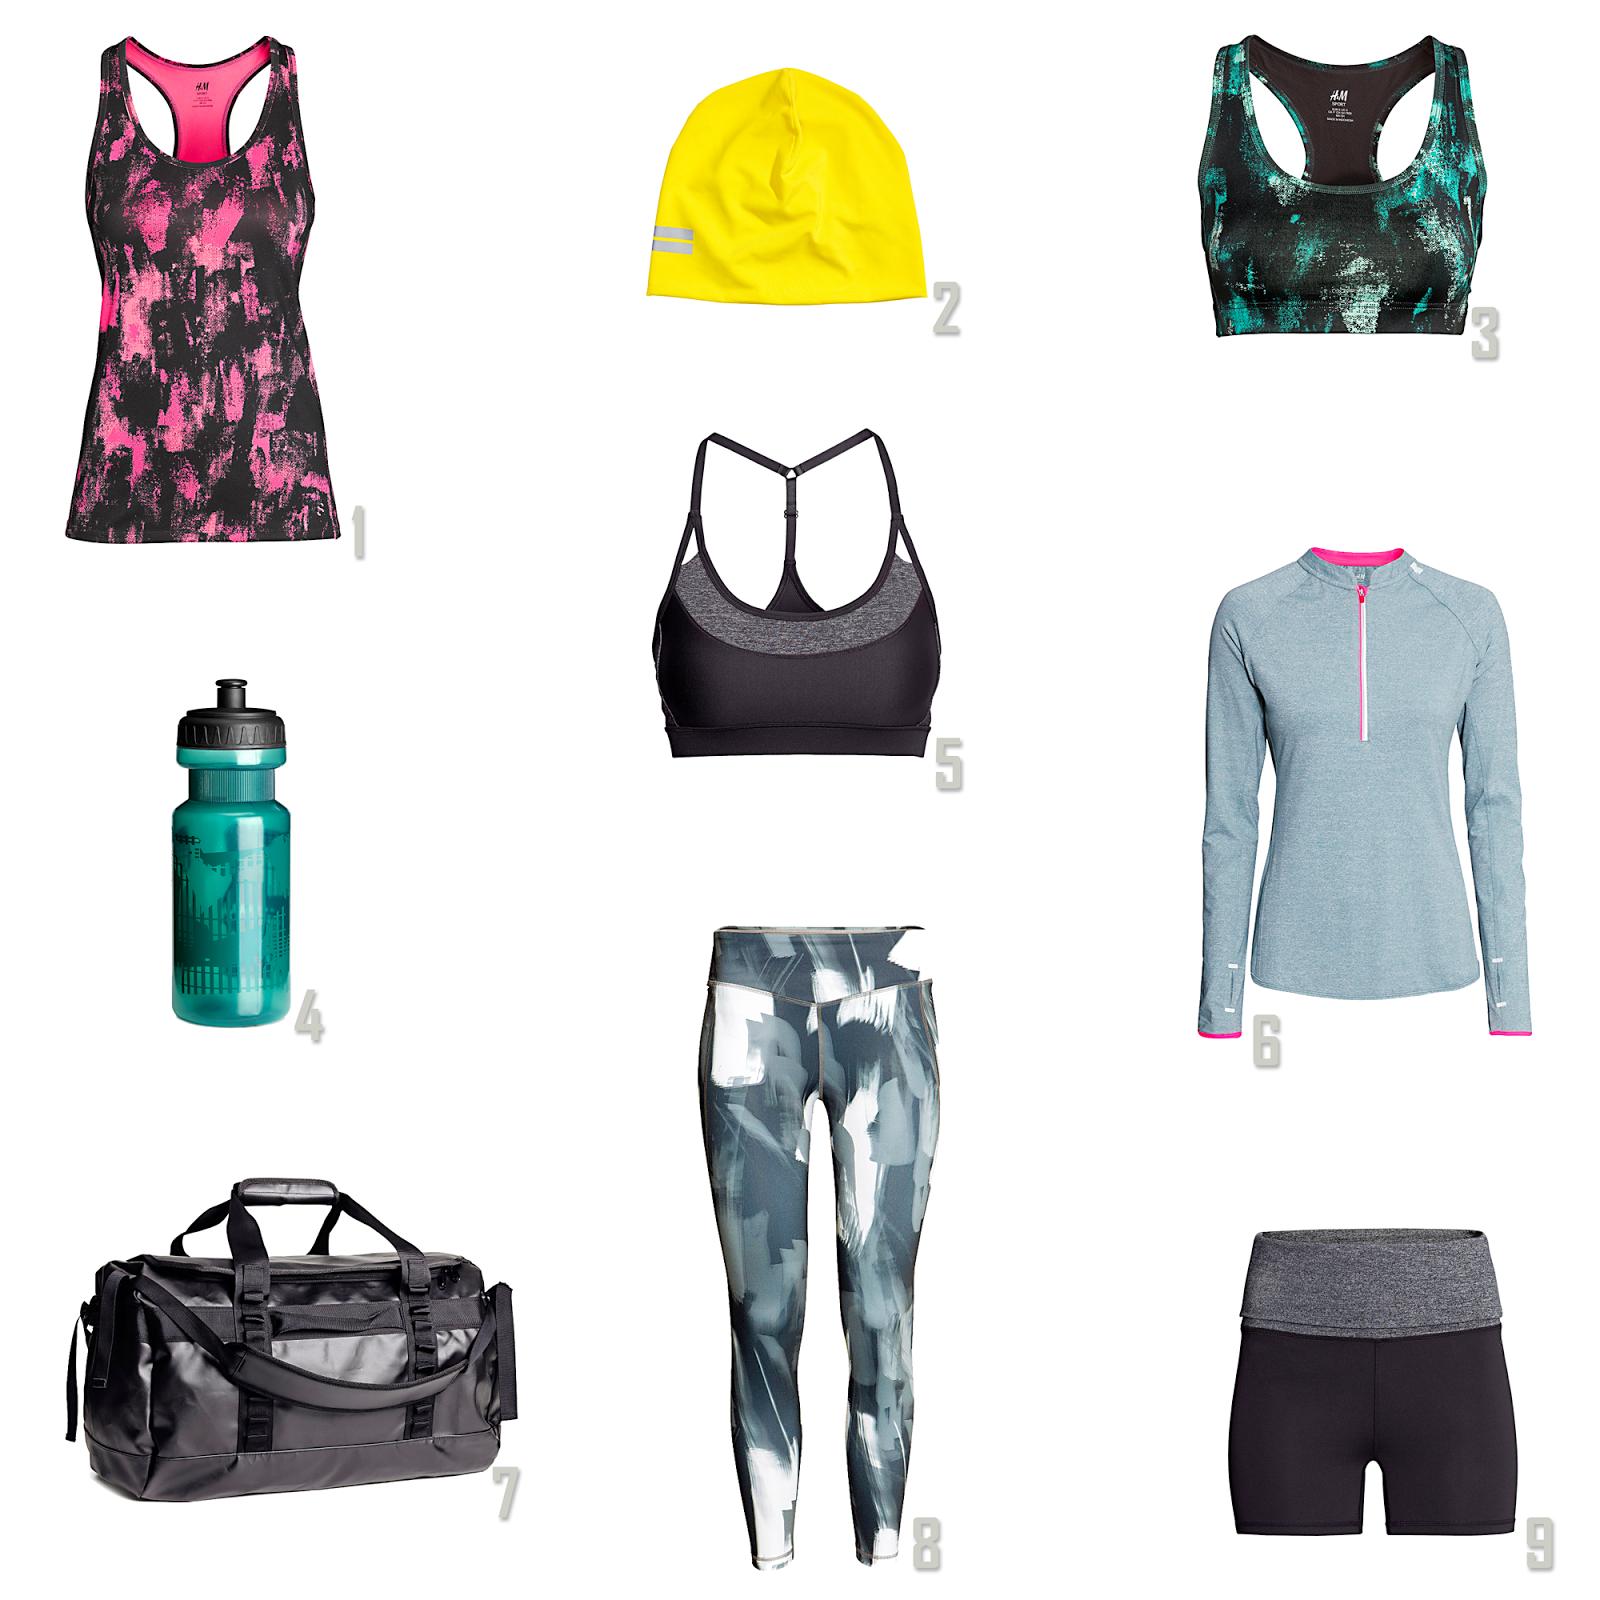 http://www.lawoftaste.com/2014/01/sportska-odjeca-sportswear.html